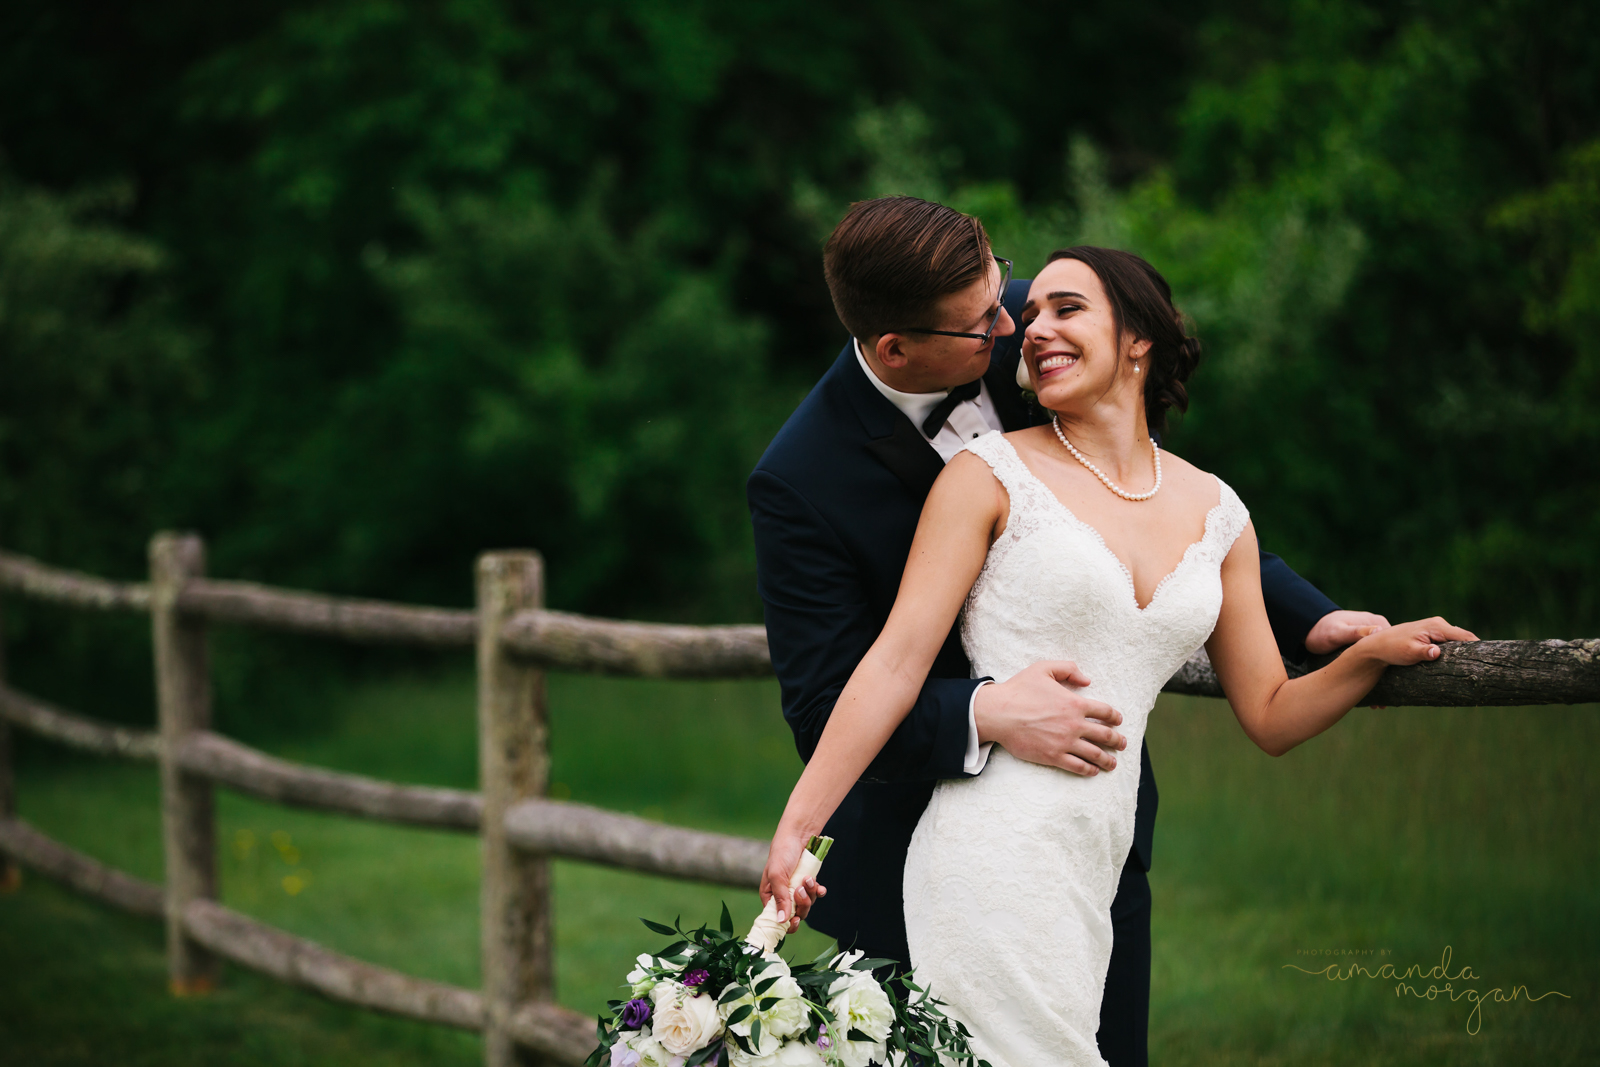 Publick-House-Wedding-Amanda-Morgan-41.jpg